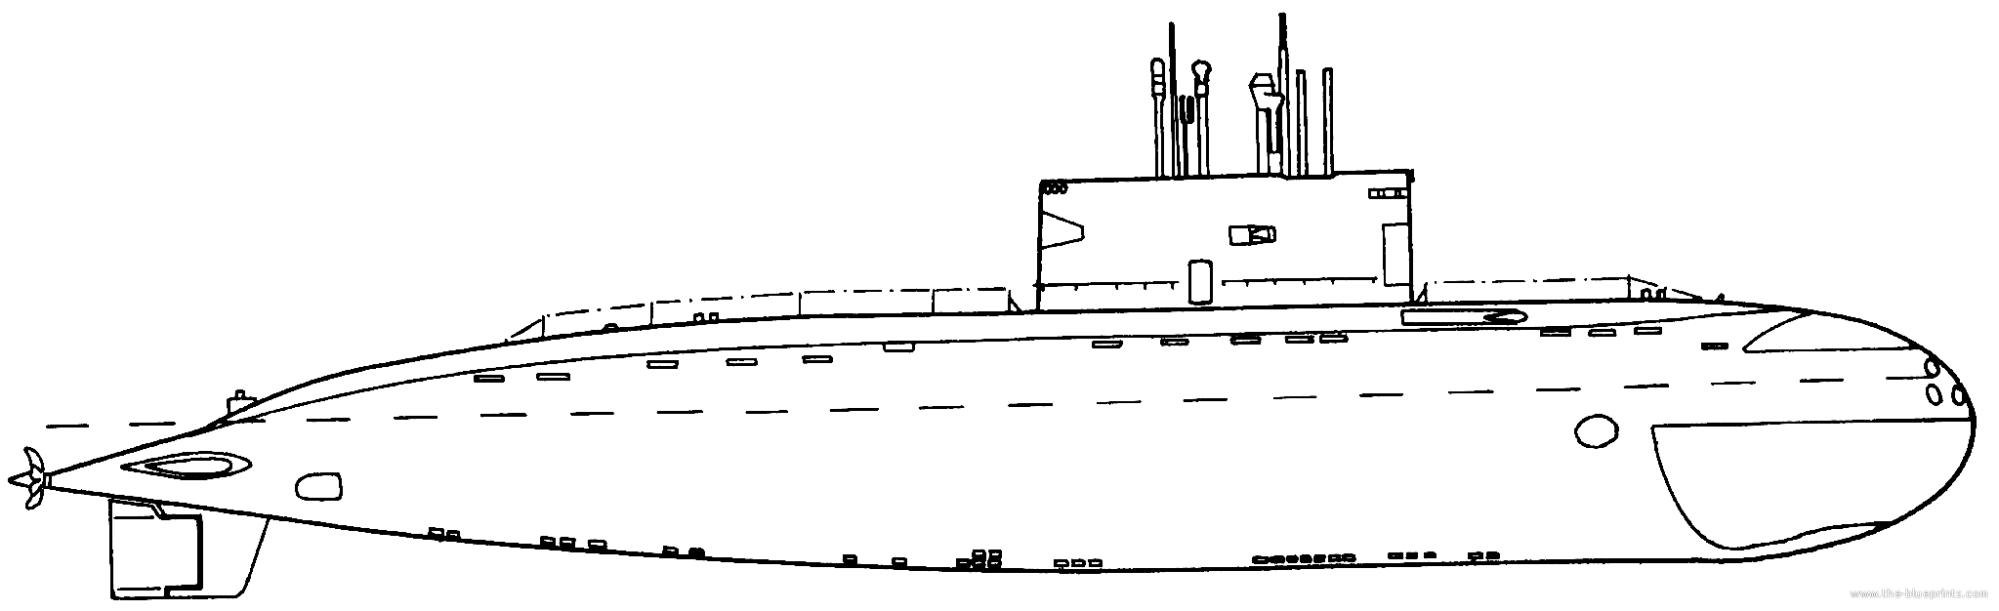 hight resolution of diagram of kilo sub